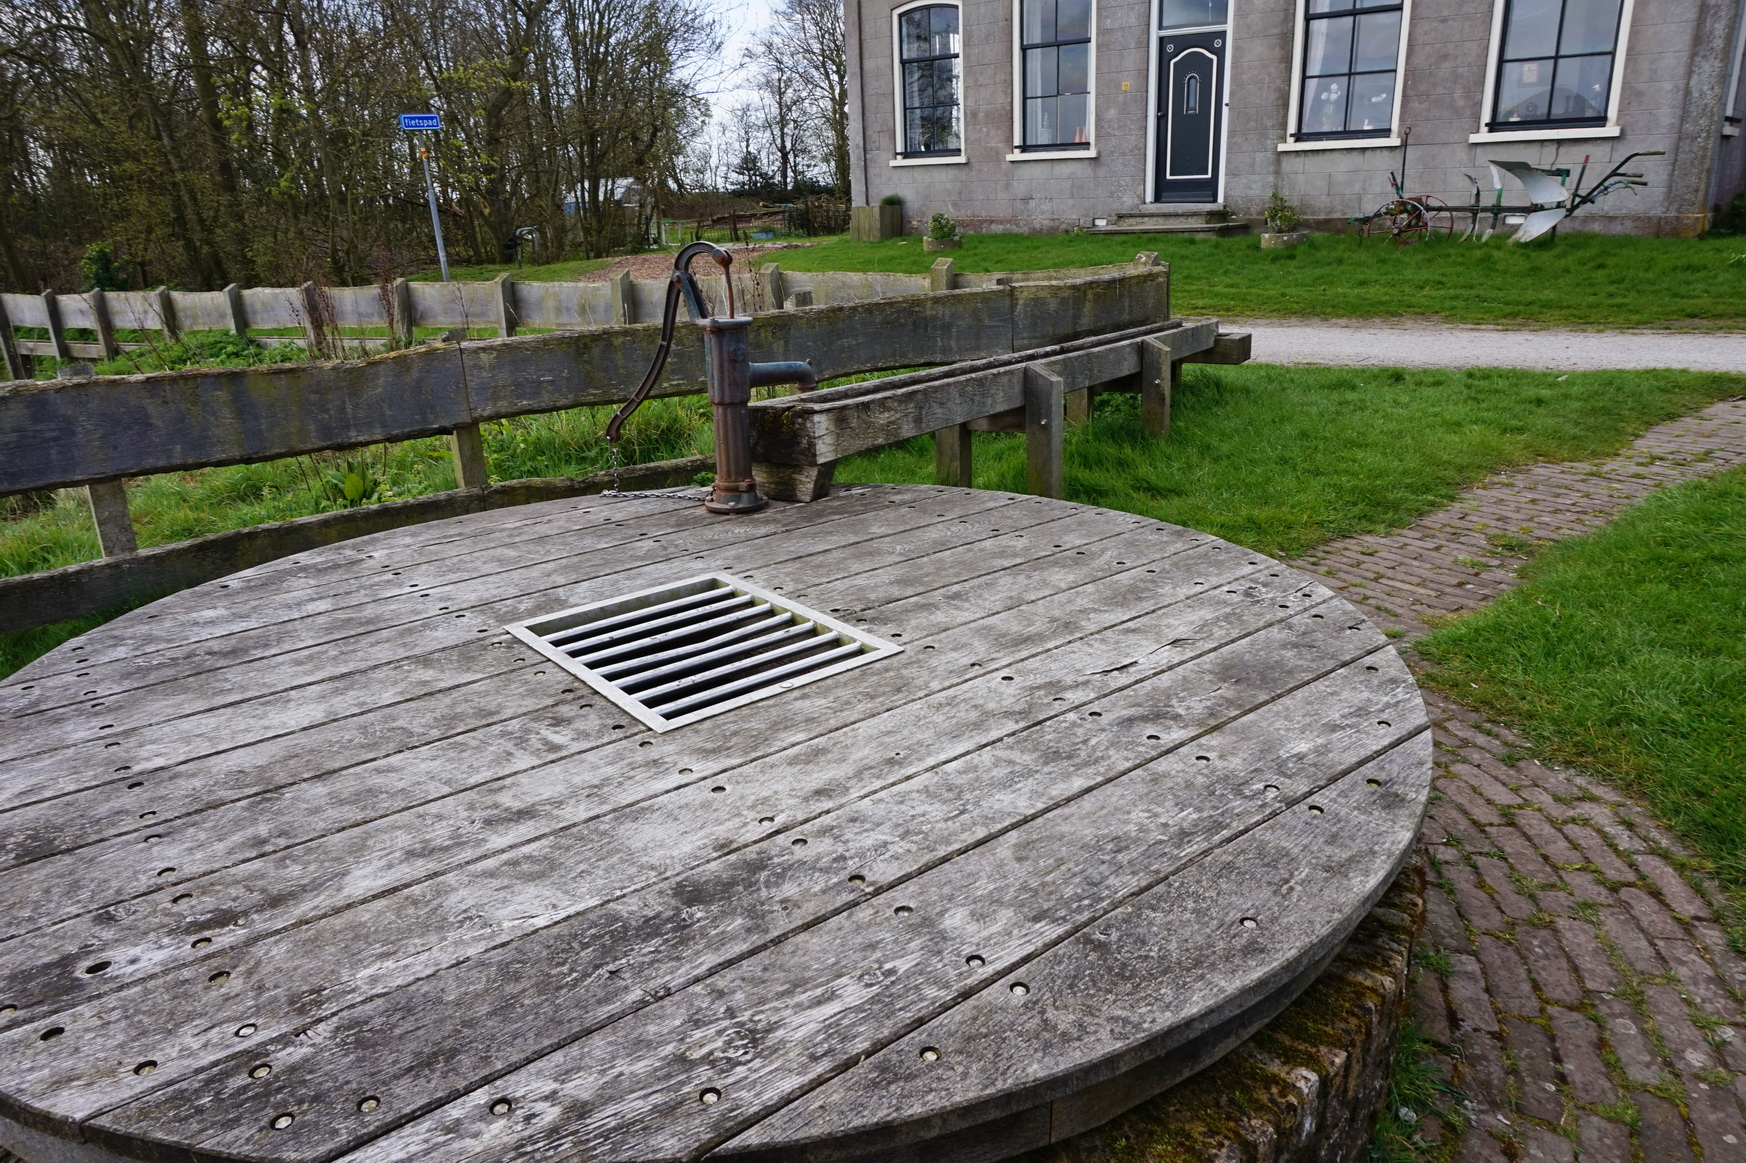 Texel - Wanderung VOC-Route 9